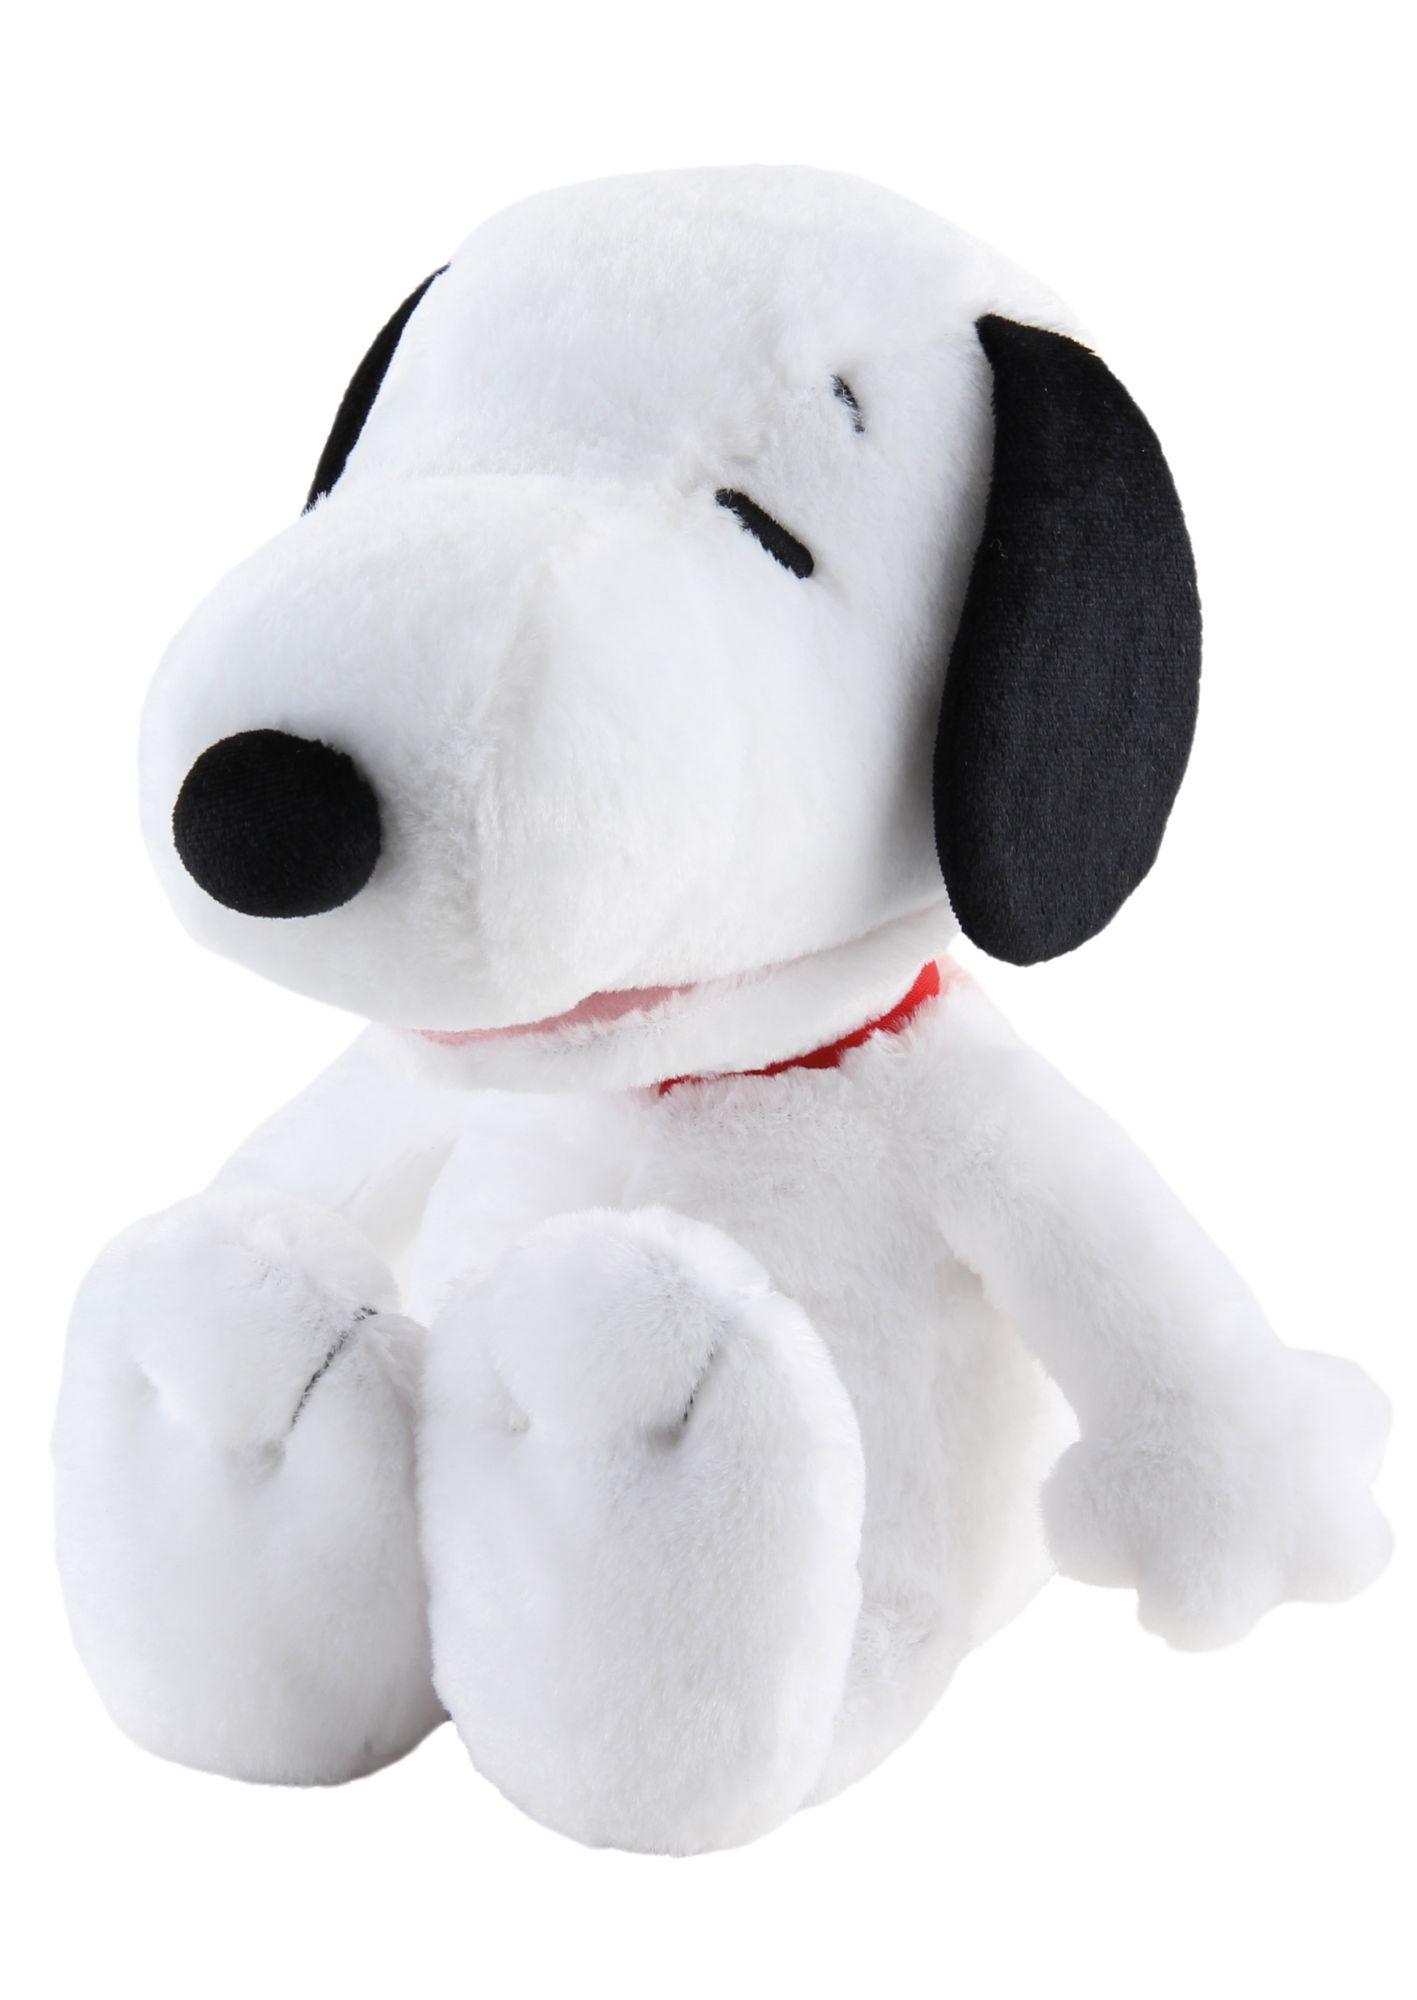 IMC TOYS IMC Toys Plüschtier mit Funktion, »Lachender Snoopy«